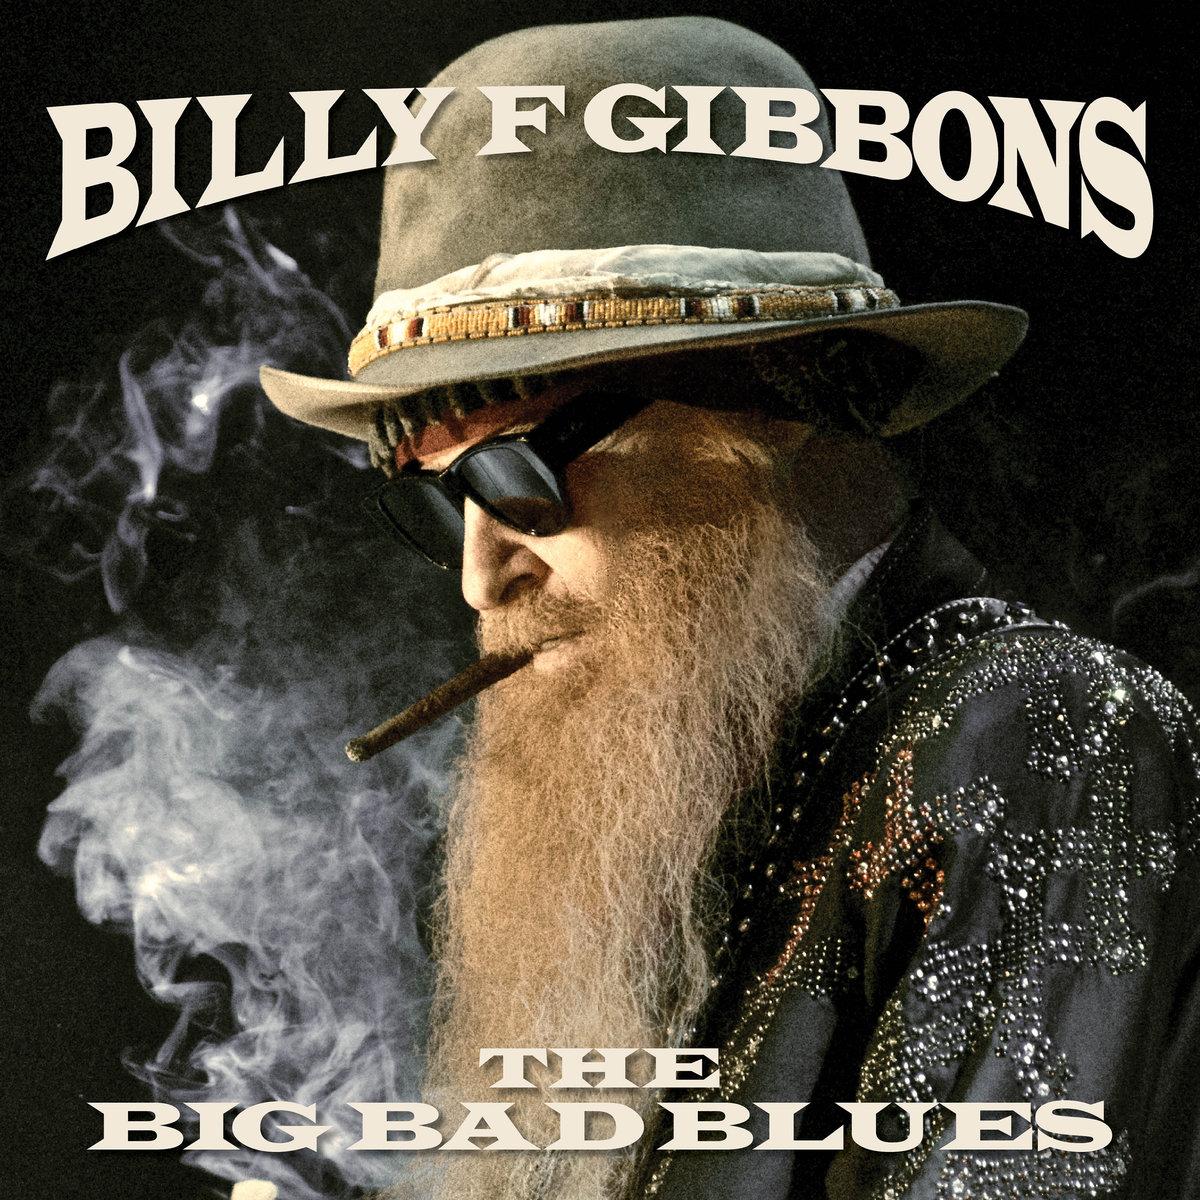 Gibbons Billy F. – Big Bad Blues